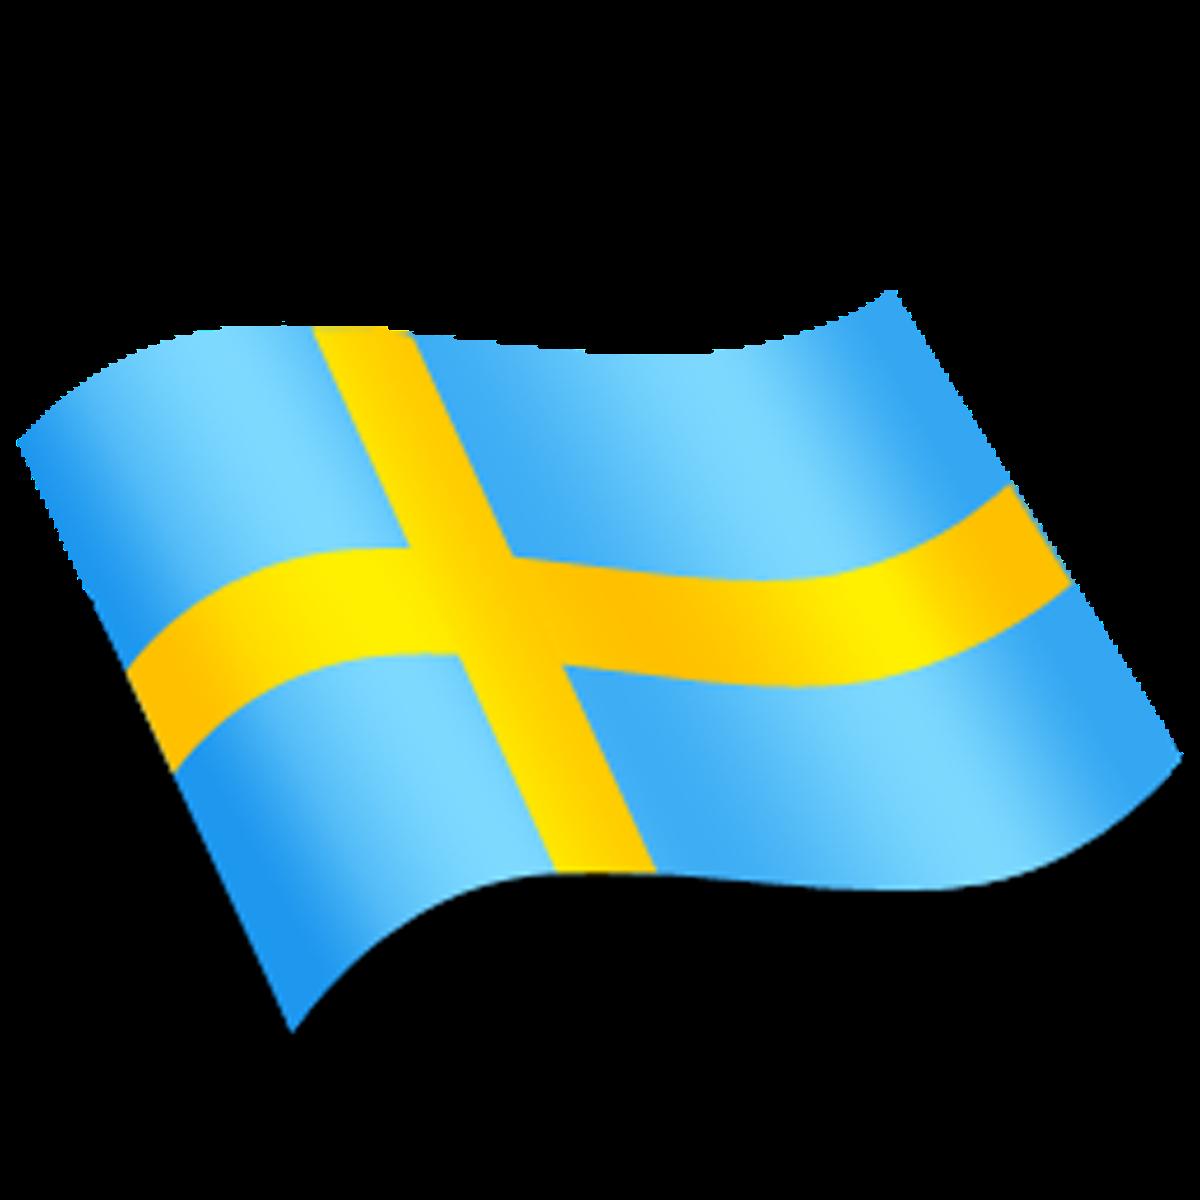 Free Animated Desktop Wallpaper For Windows 8 Graafix Wallpapers Flag Of Sweden